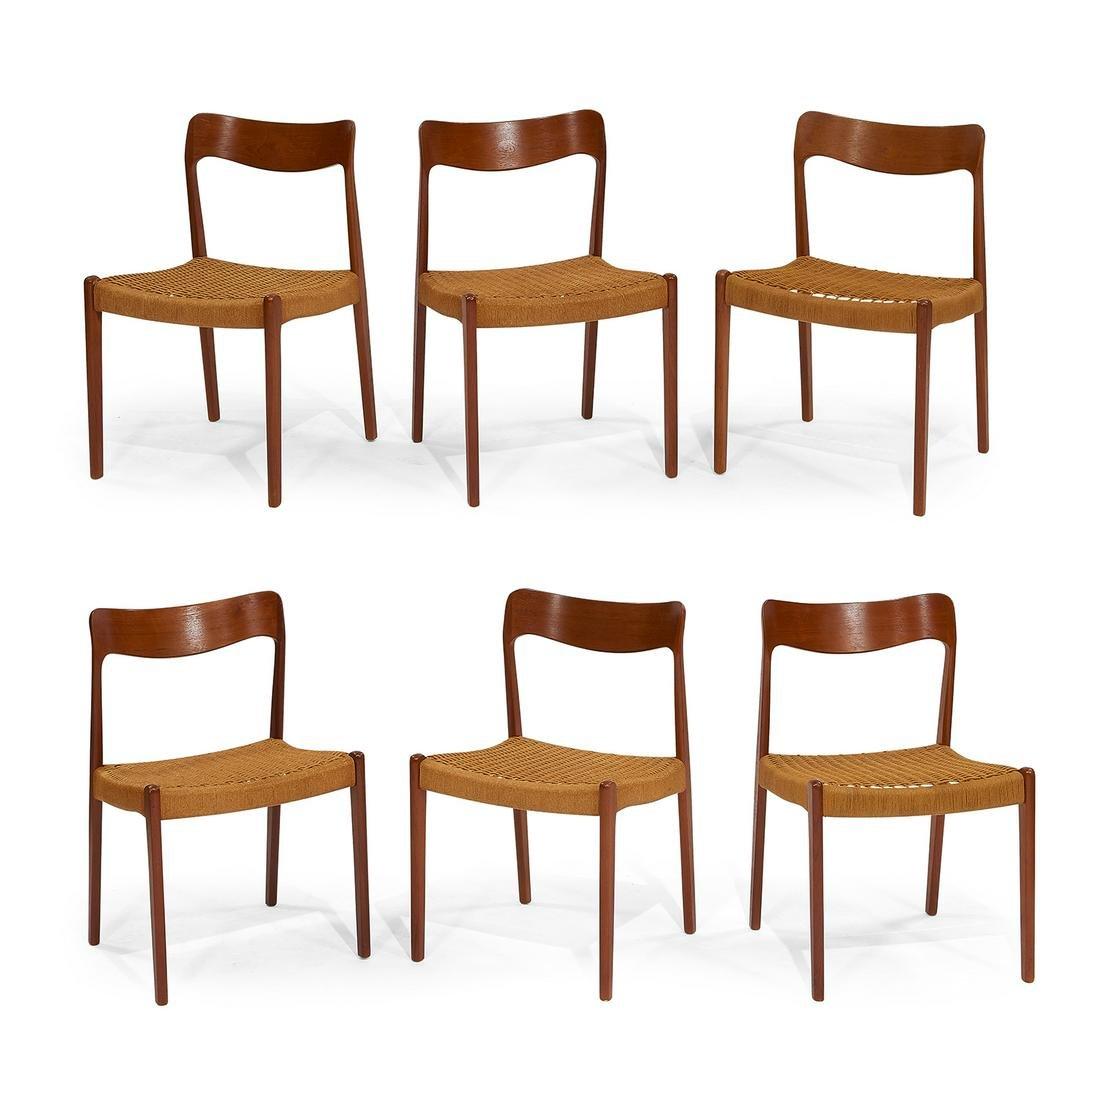 Danish Modern dining chairs, set of six